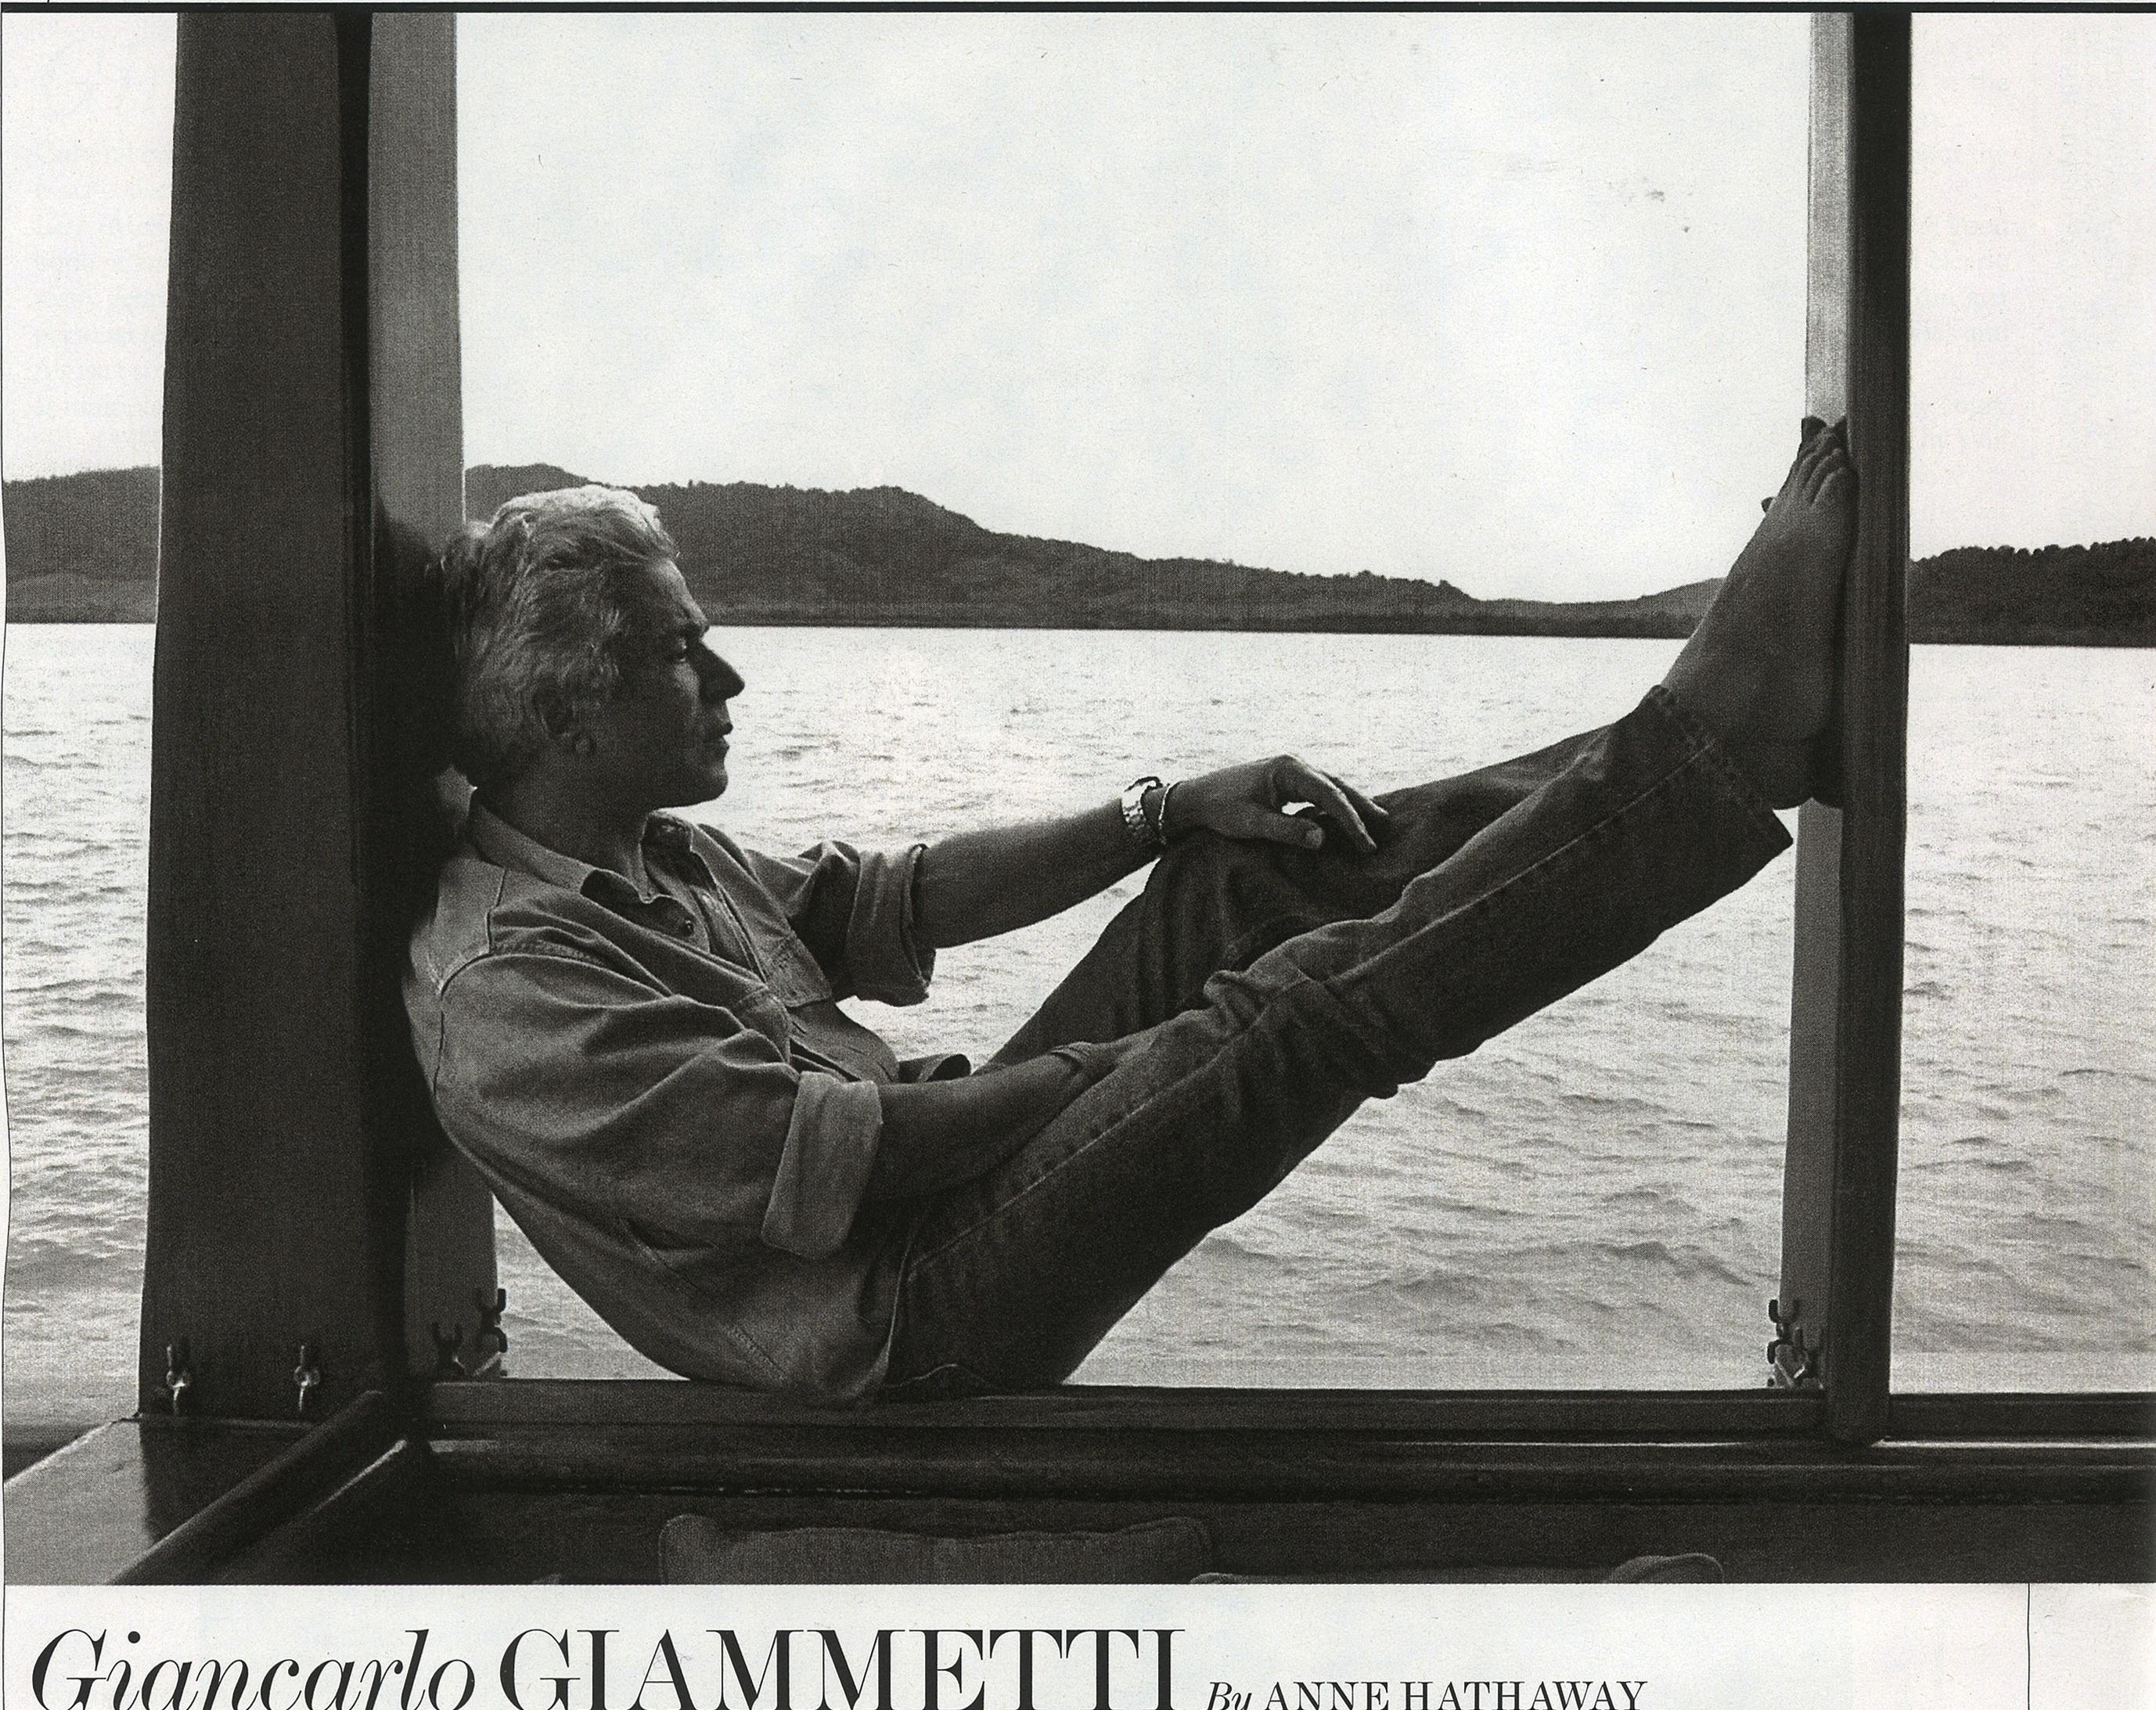 Giancarlo Giammetti